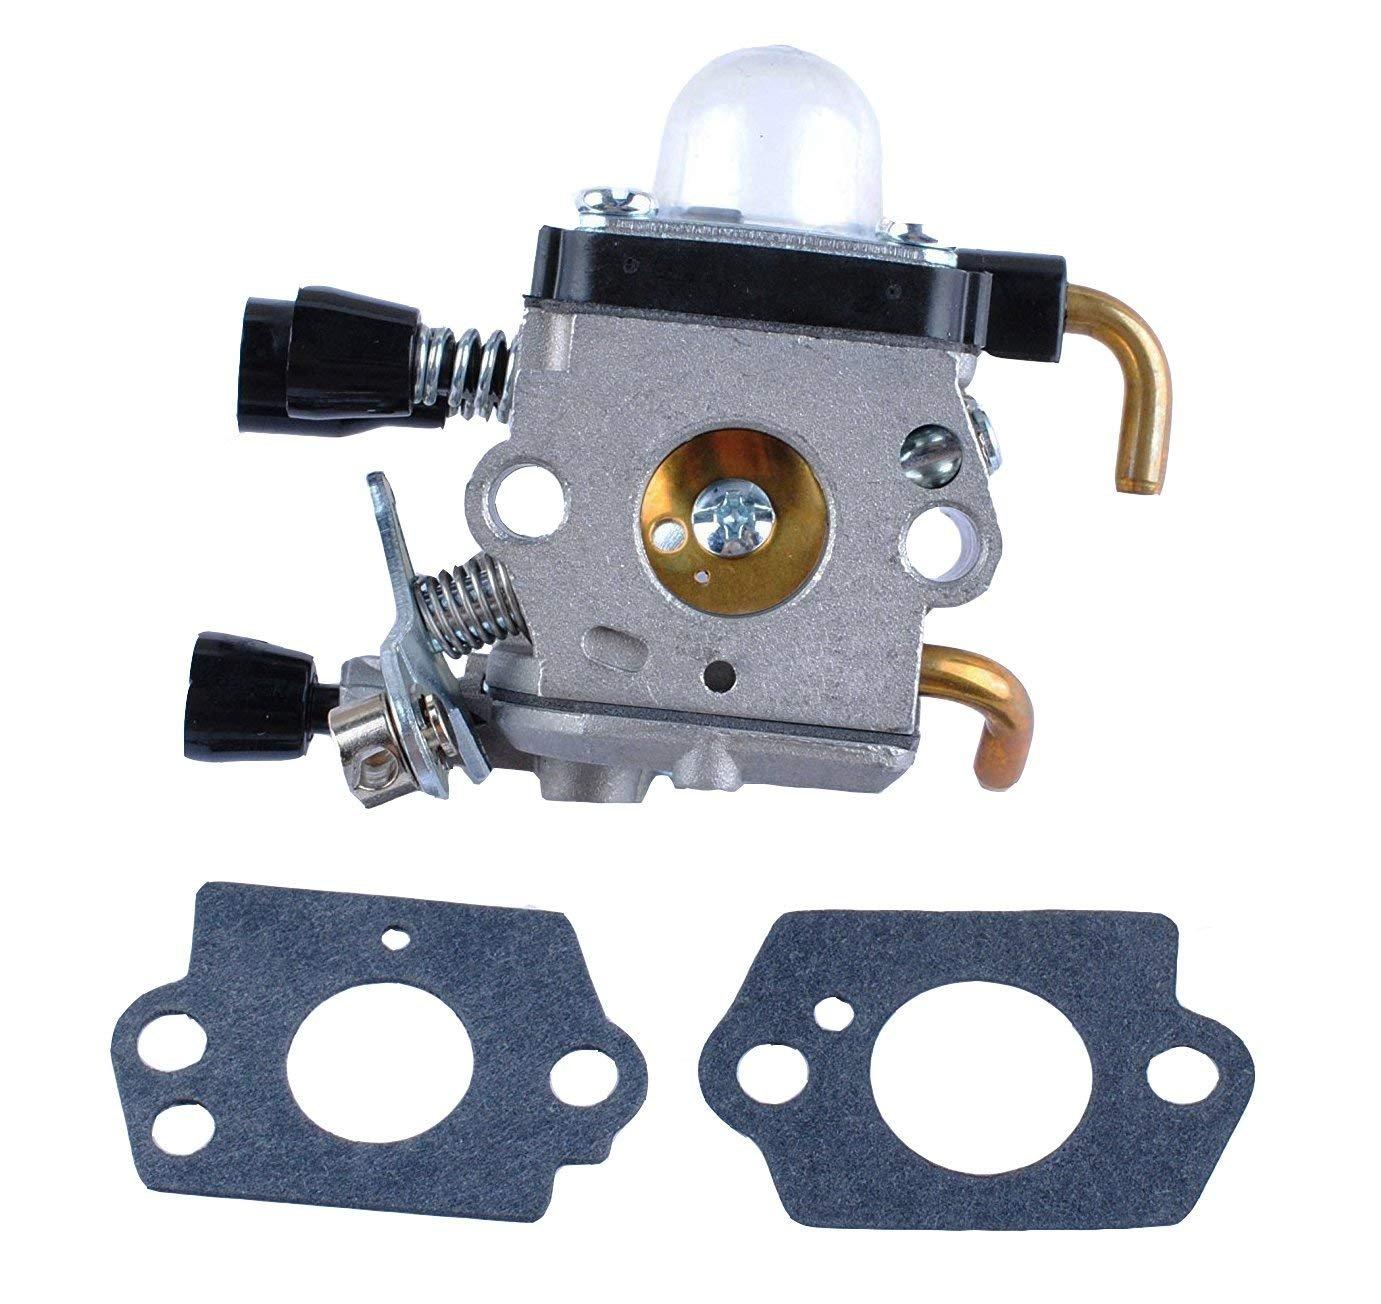 Stihl Bg55 Parts Diagram Carburetor Also Furthermore Chainsaw Poweka Replace Zama For A Ciq 1381x1304